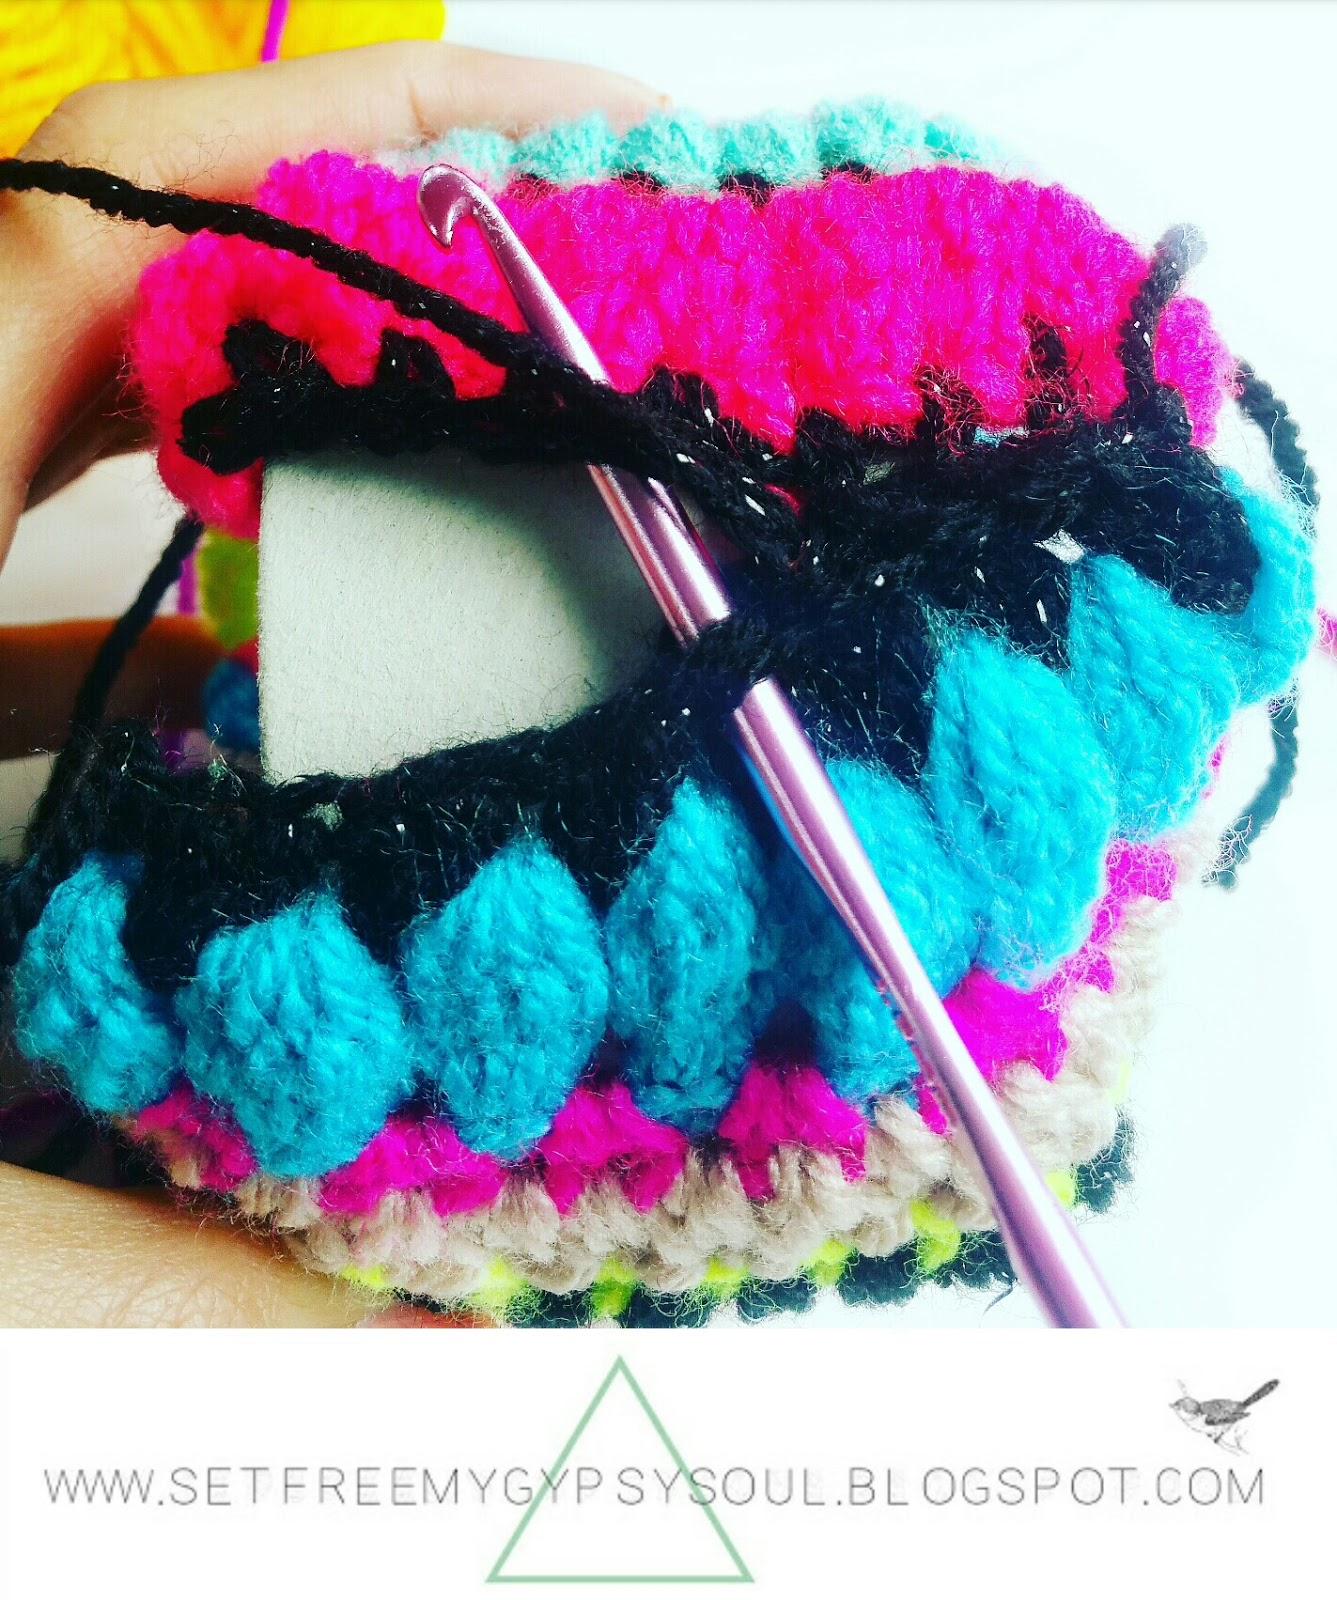 crochet jewellery bangle bracelet pattern free boho hippie tribal pom pom